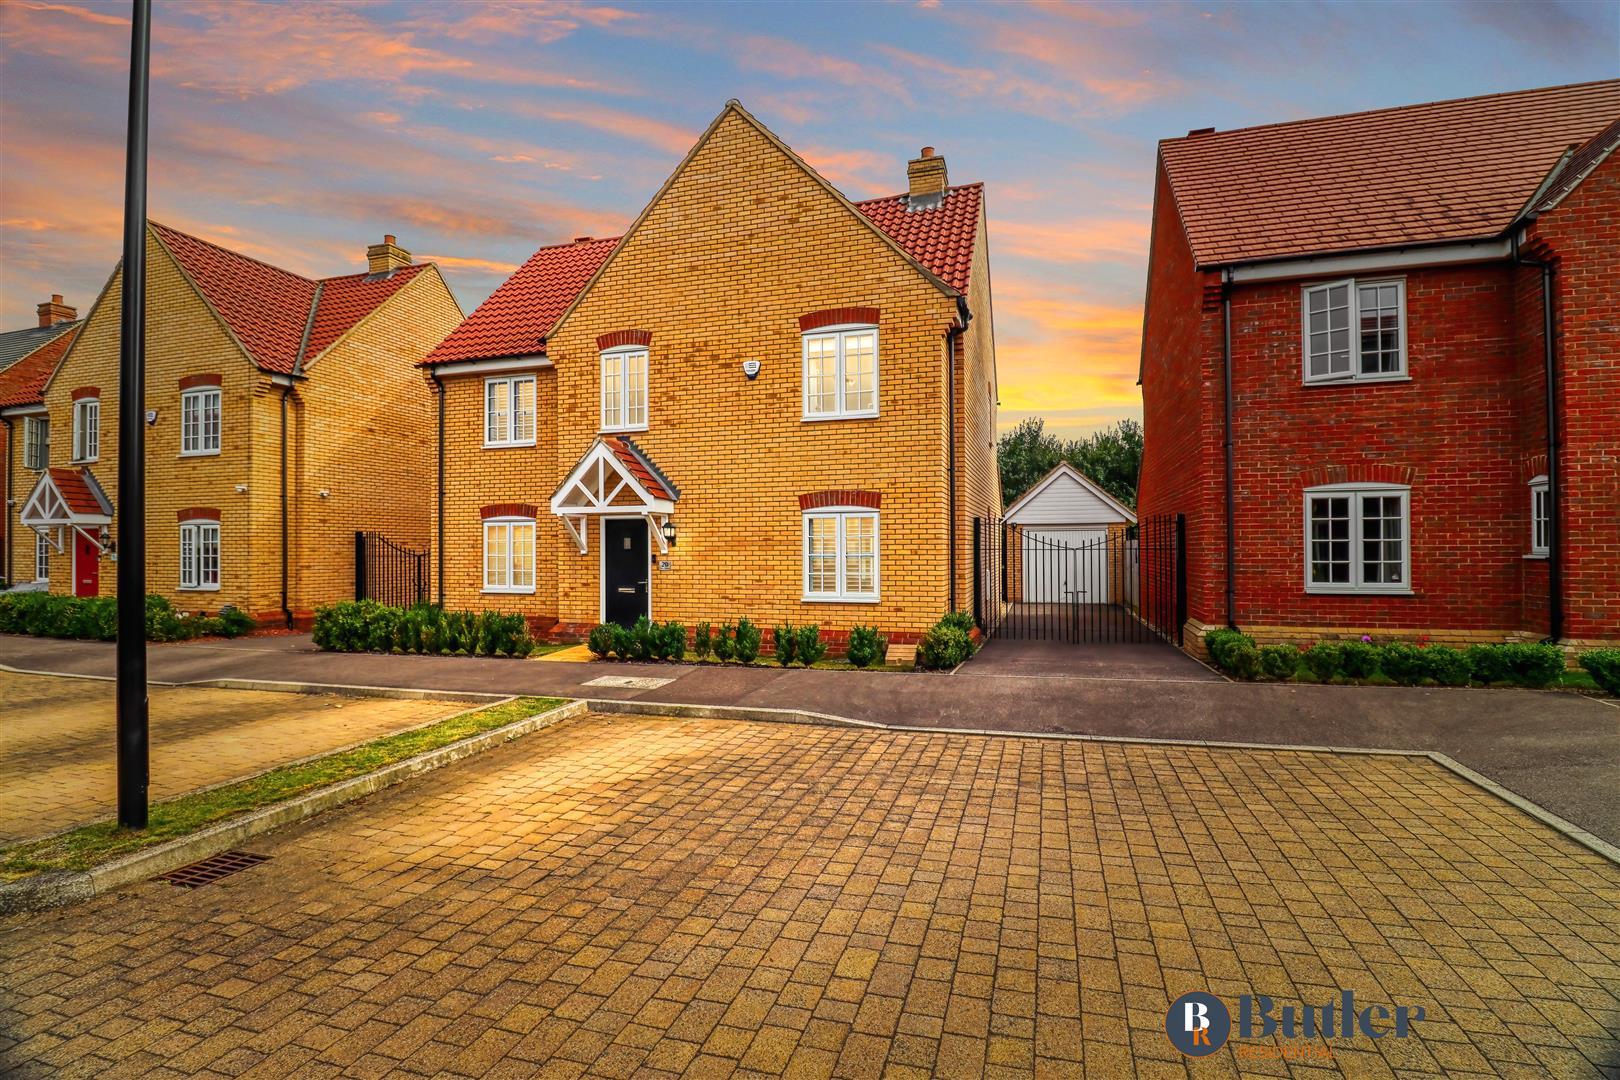 4 bed detached house for sale in Wren Terrace, Bedford, MK42